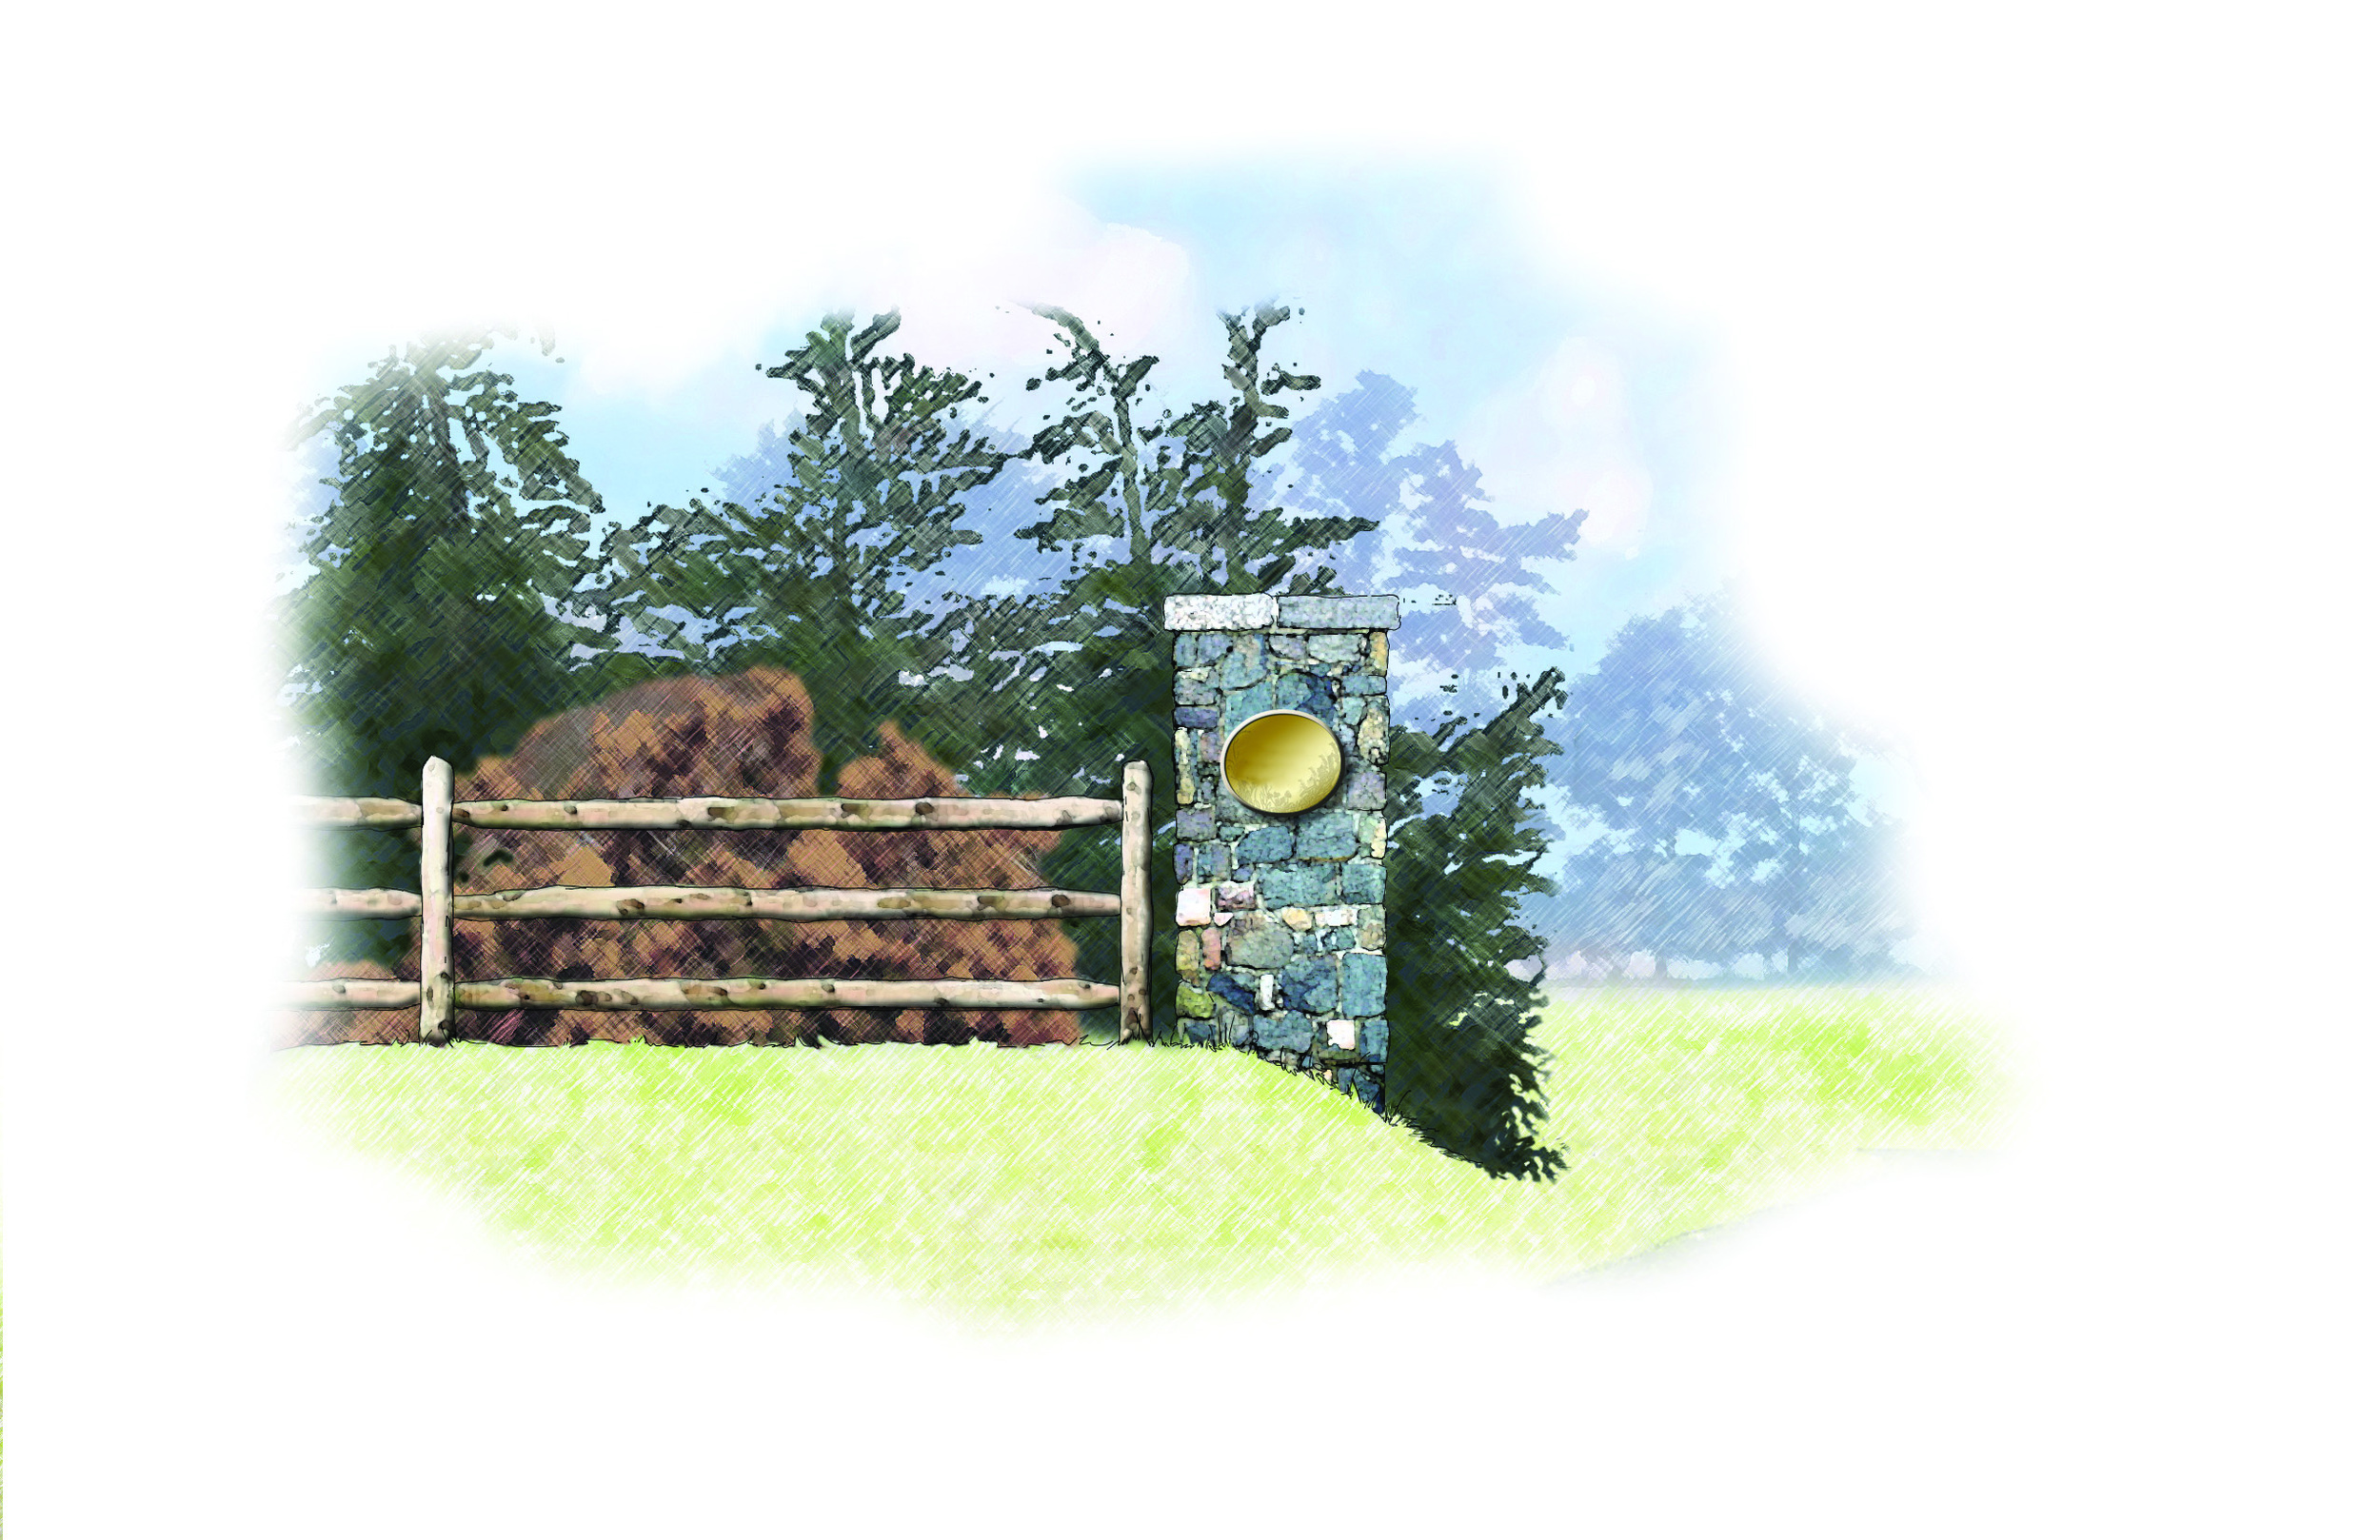 Entrance gate 11x17 no gate 1-2scale blowup copy.jpg